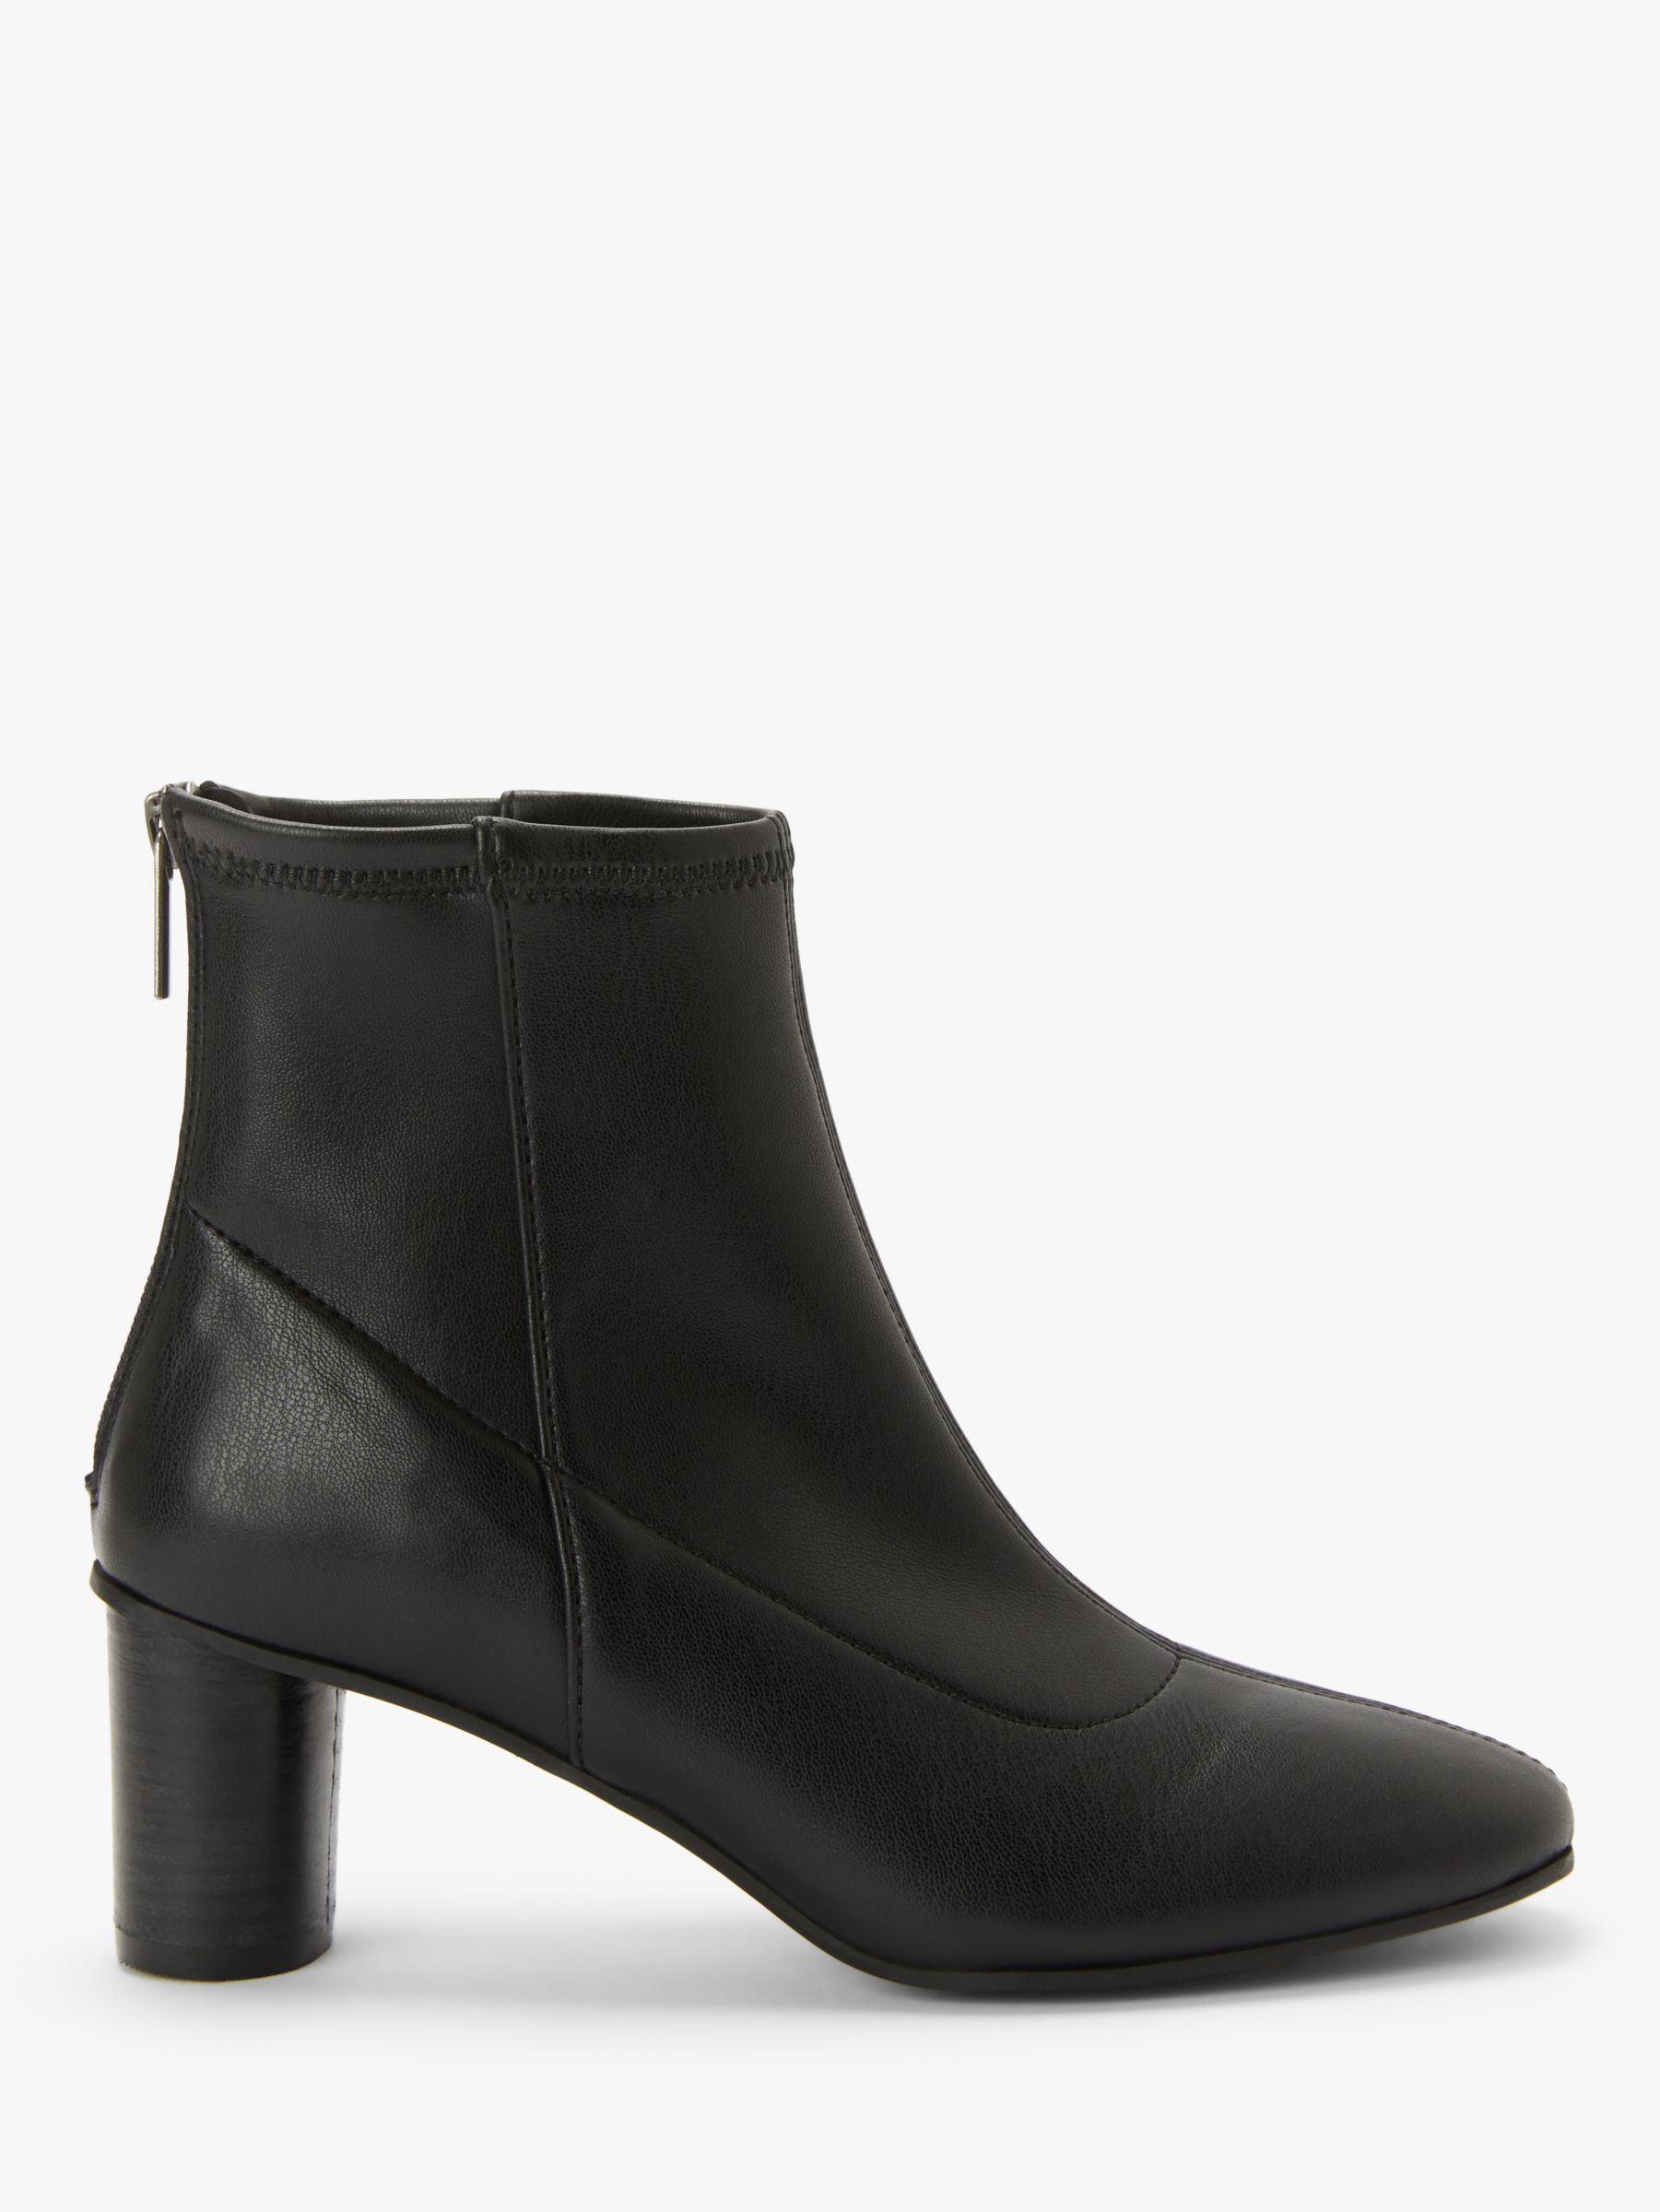 Kin Kin Paulo Cylindrical Heel Ankle Boots, Black